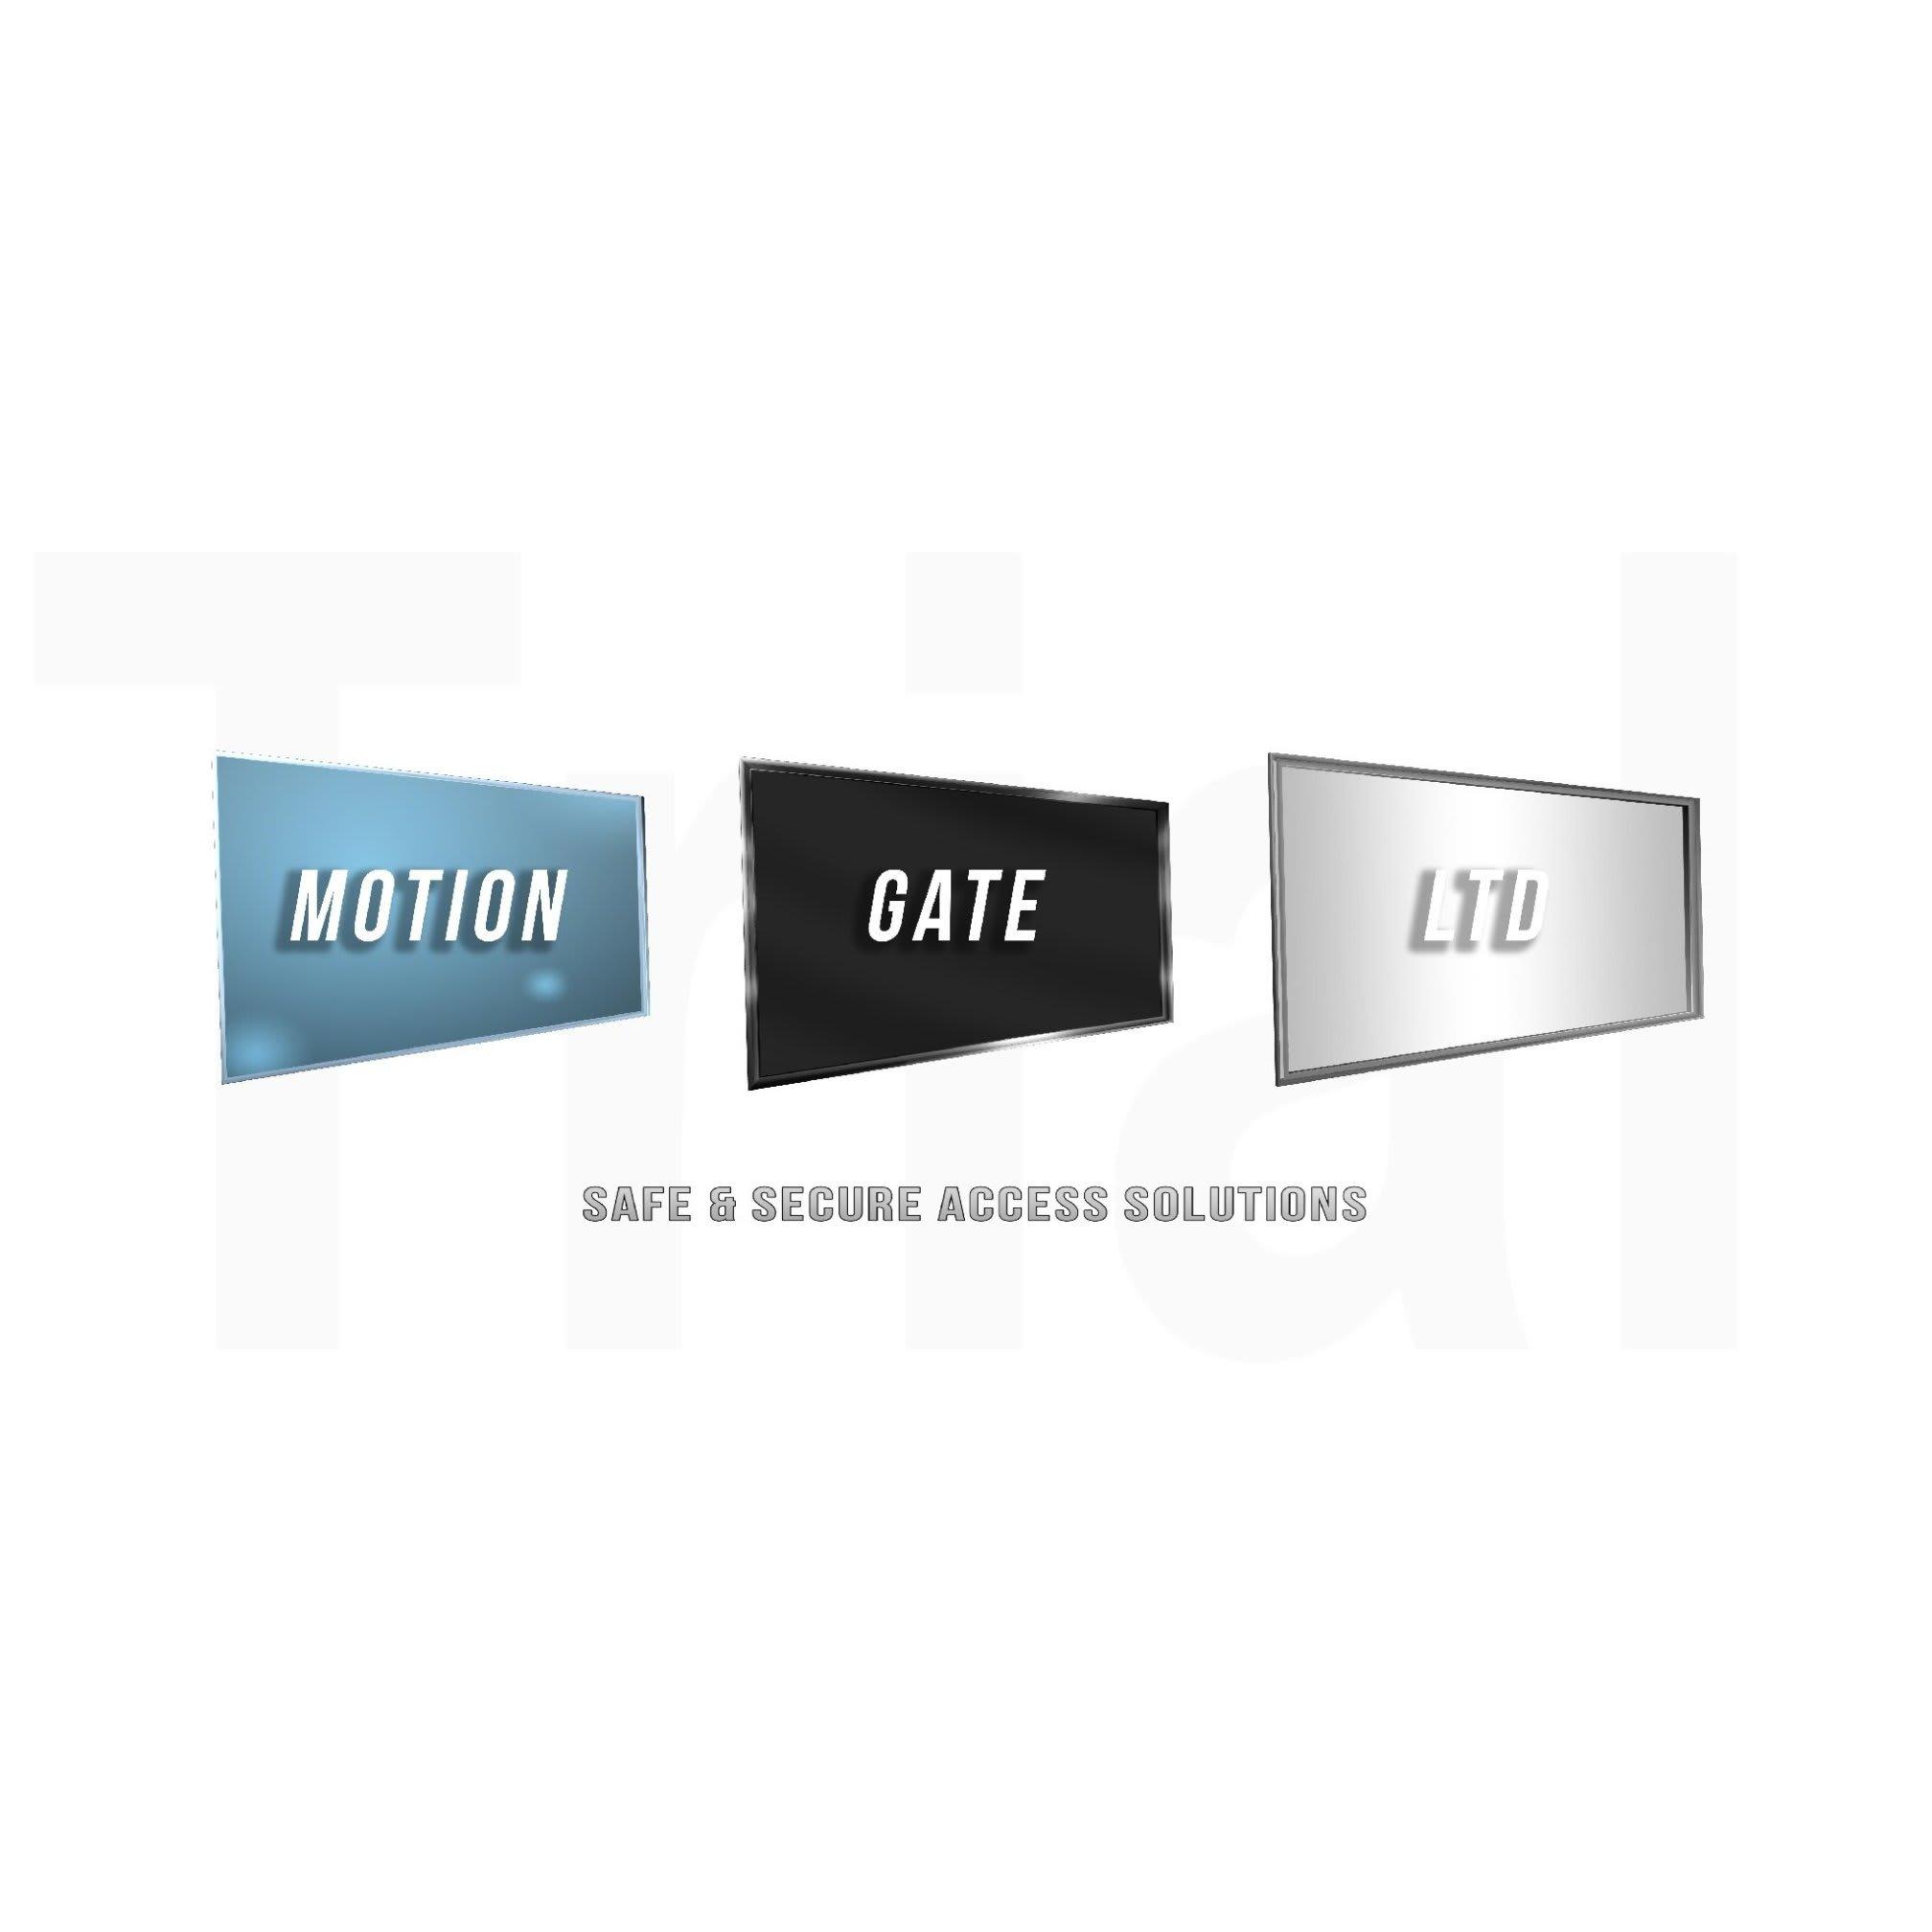 Motion Gate Ltd - Bristol, Gloucestershire BS34 8LX - 01172 872404 | ShowMeLocal.com